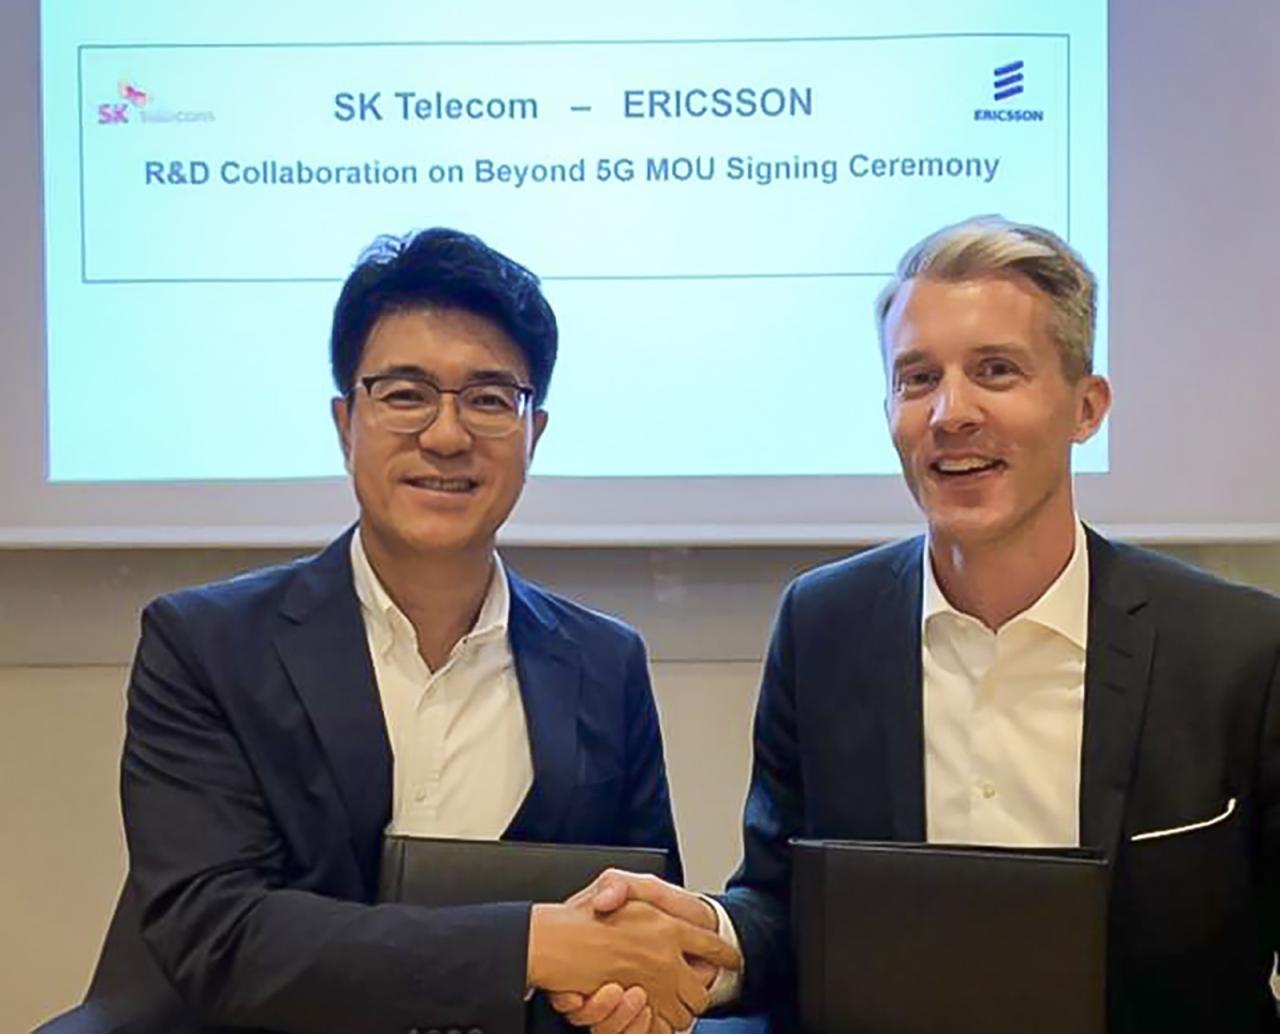 SKT to develop 6G network tech with Nokia, Ericsson